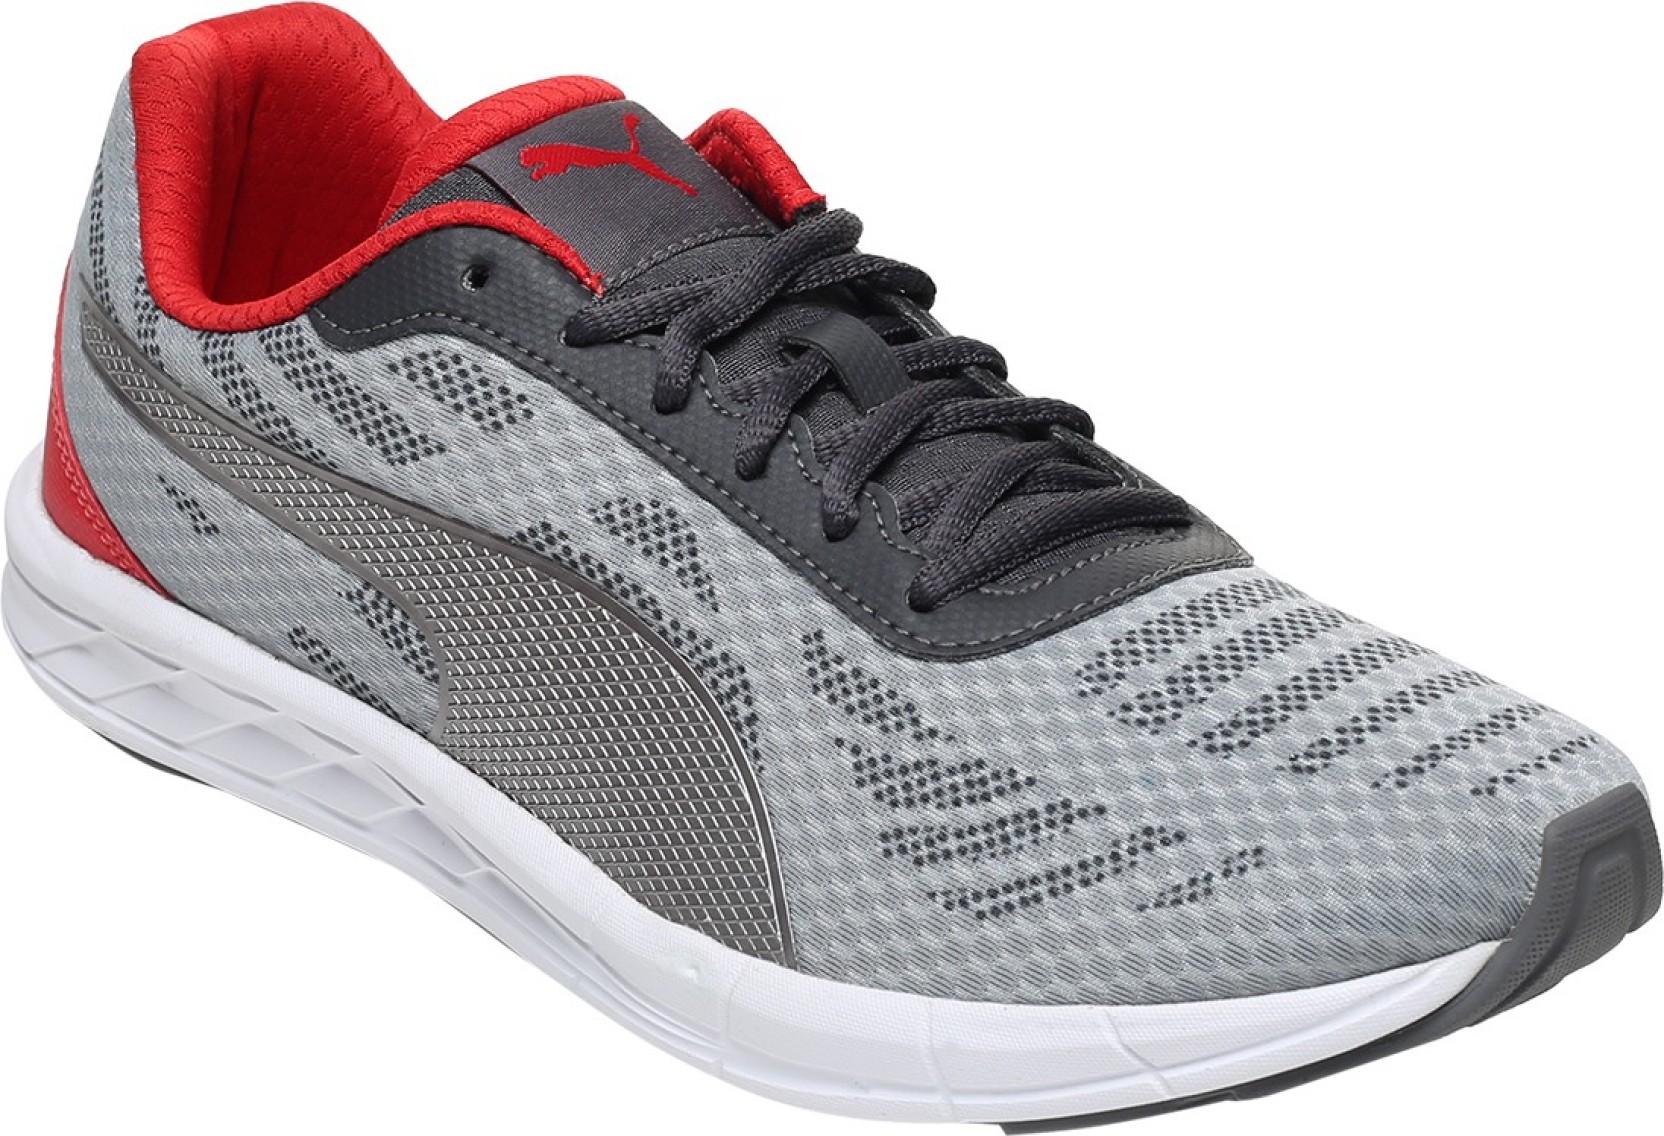 5fa7ce1e898 Puma Meteor IDP Running Shoes For Men - Buy Grey Color Puma Meteor ...